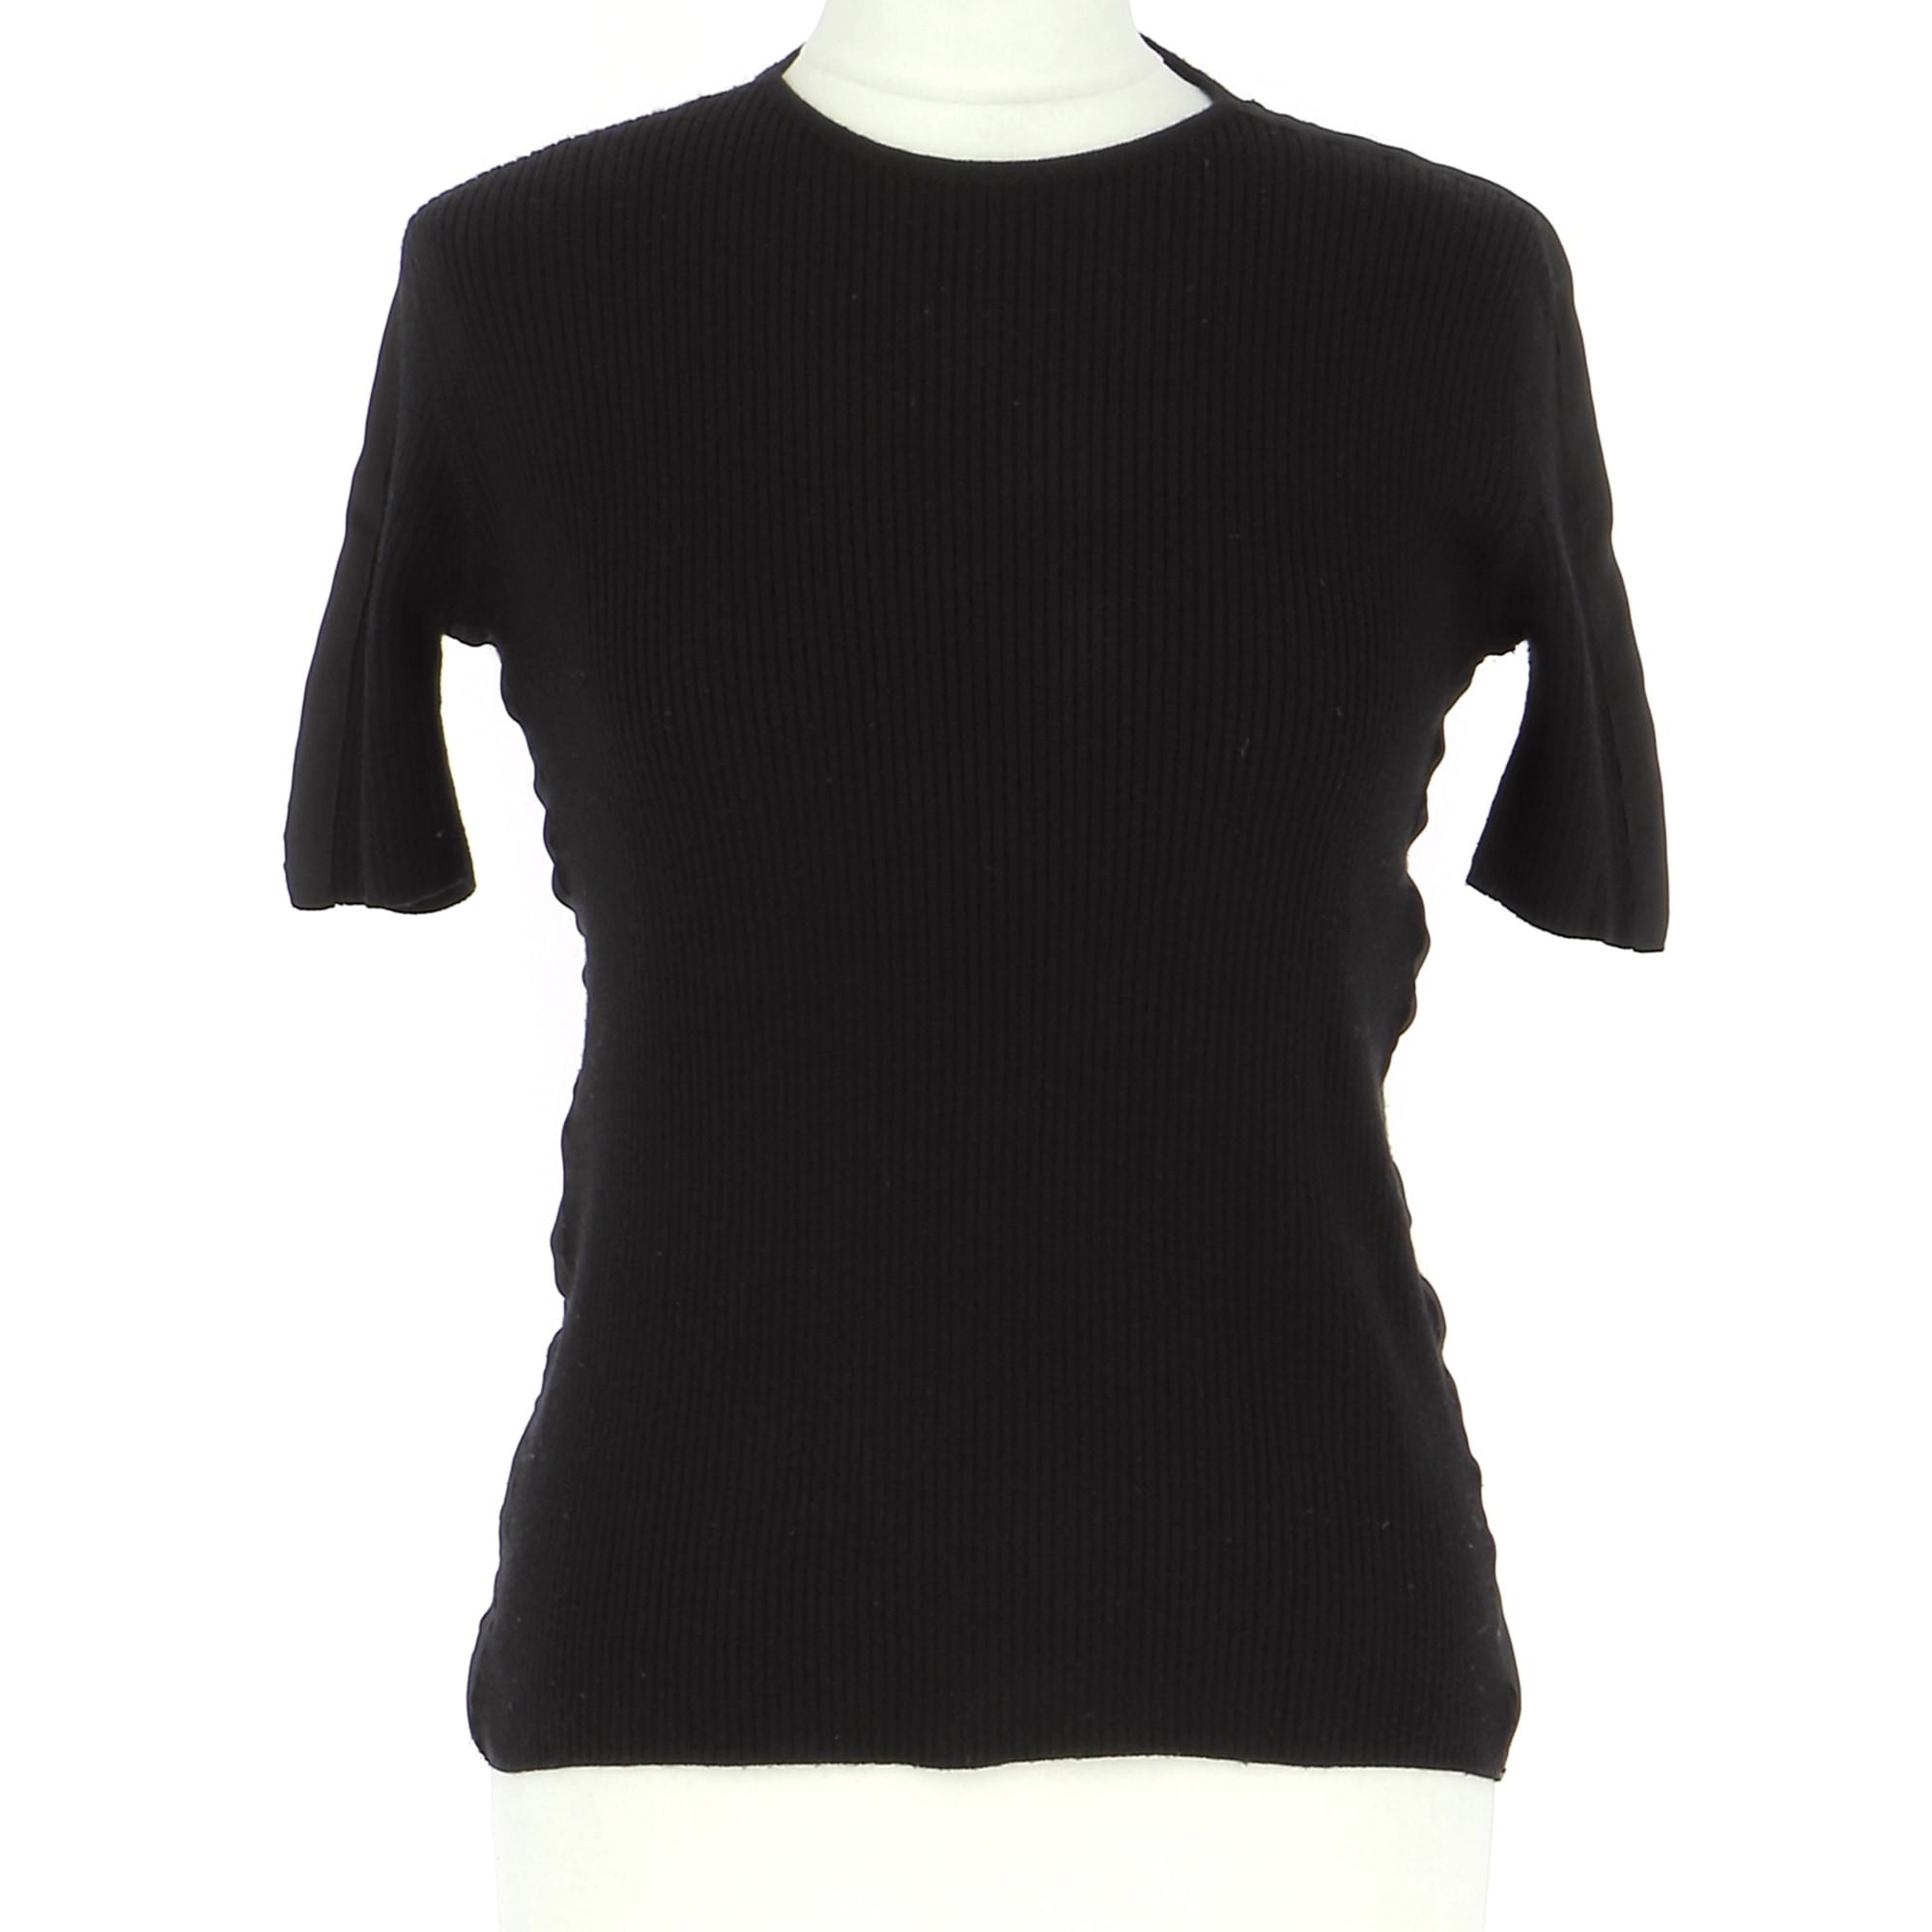 Top, T-shirt ALAIN MANOUKIAN Black